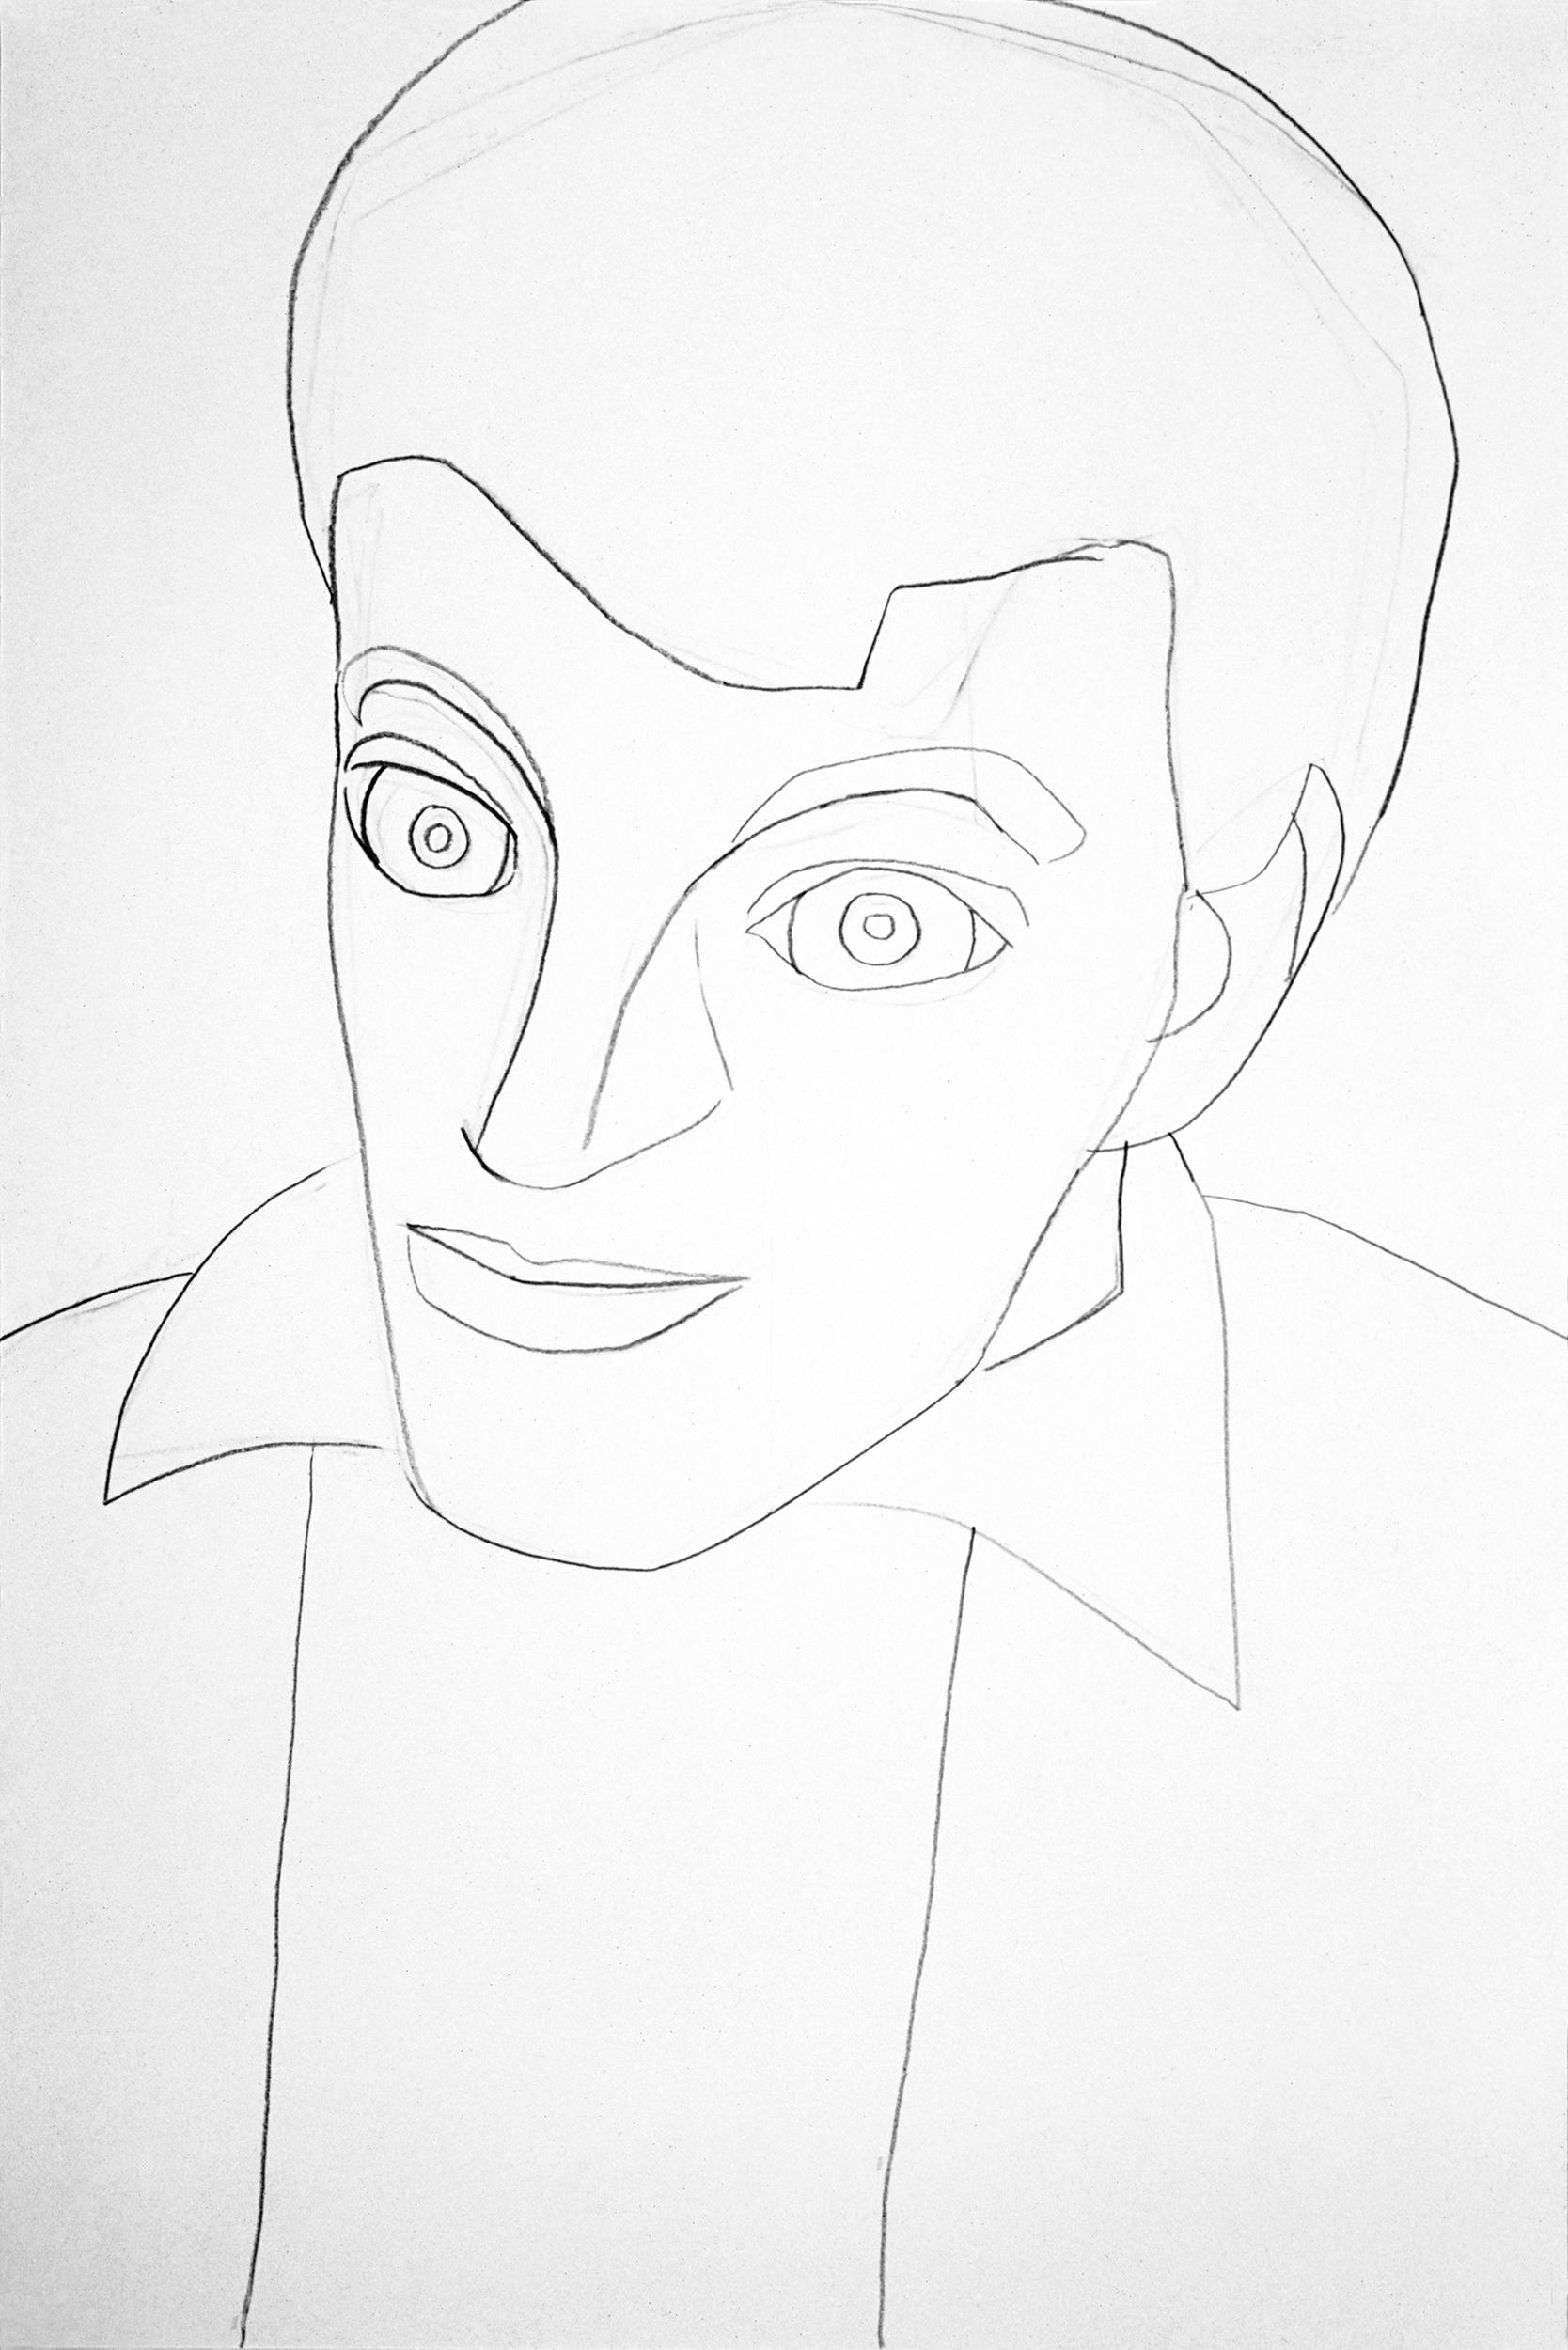 Self-portrait, drawing by Wouter van Riessen